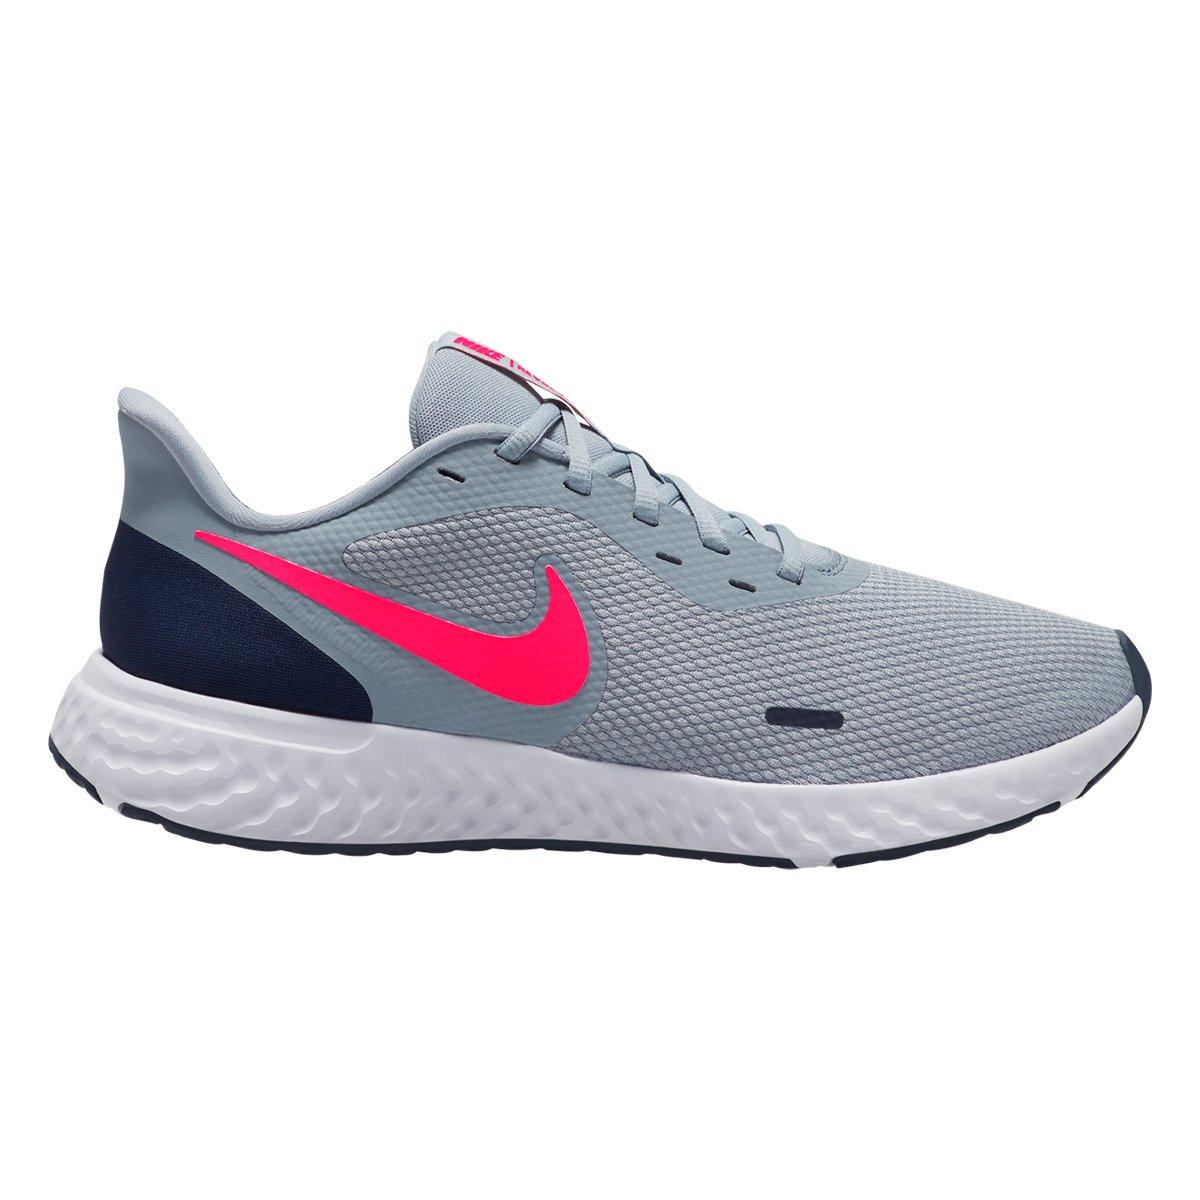 Identidad Sin valor maorí  Tênis Nike Revolution 5 Masculino - Azul e Marinho   Zattini